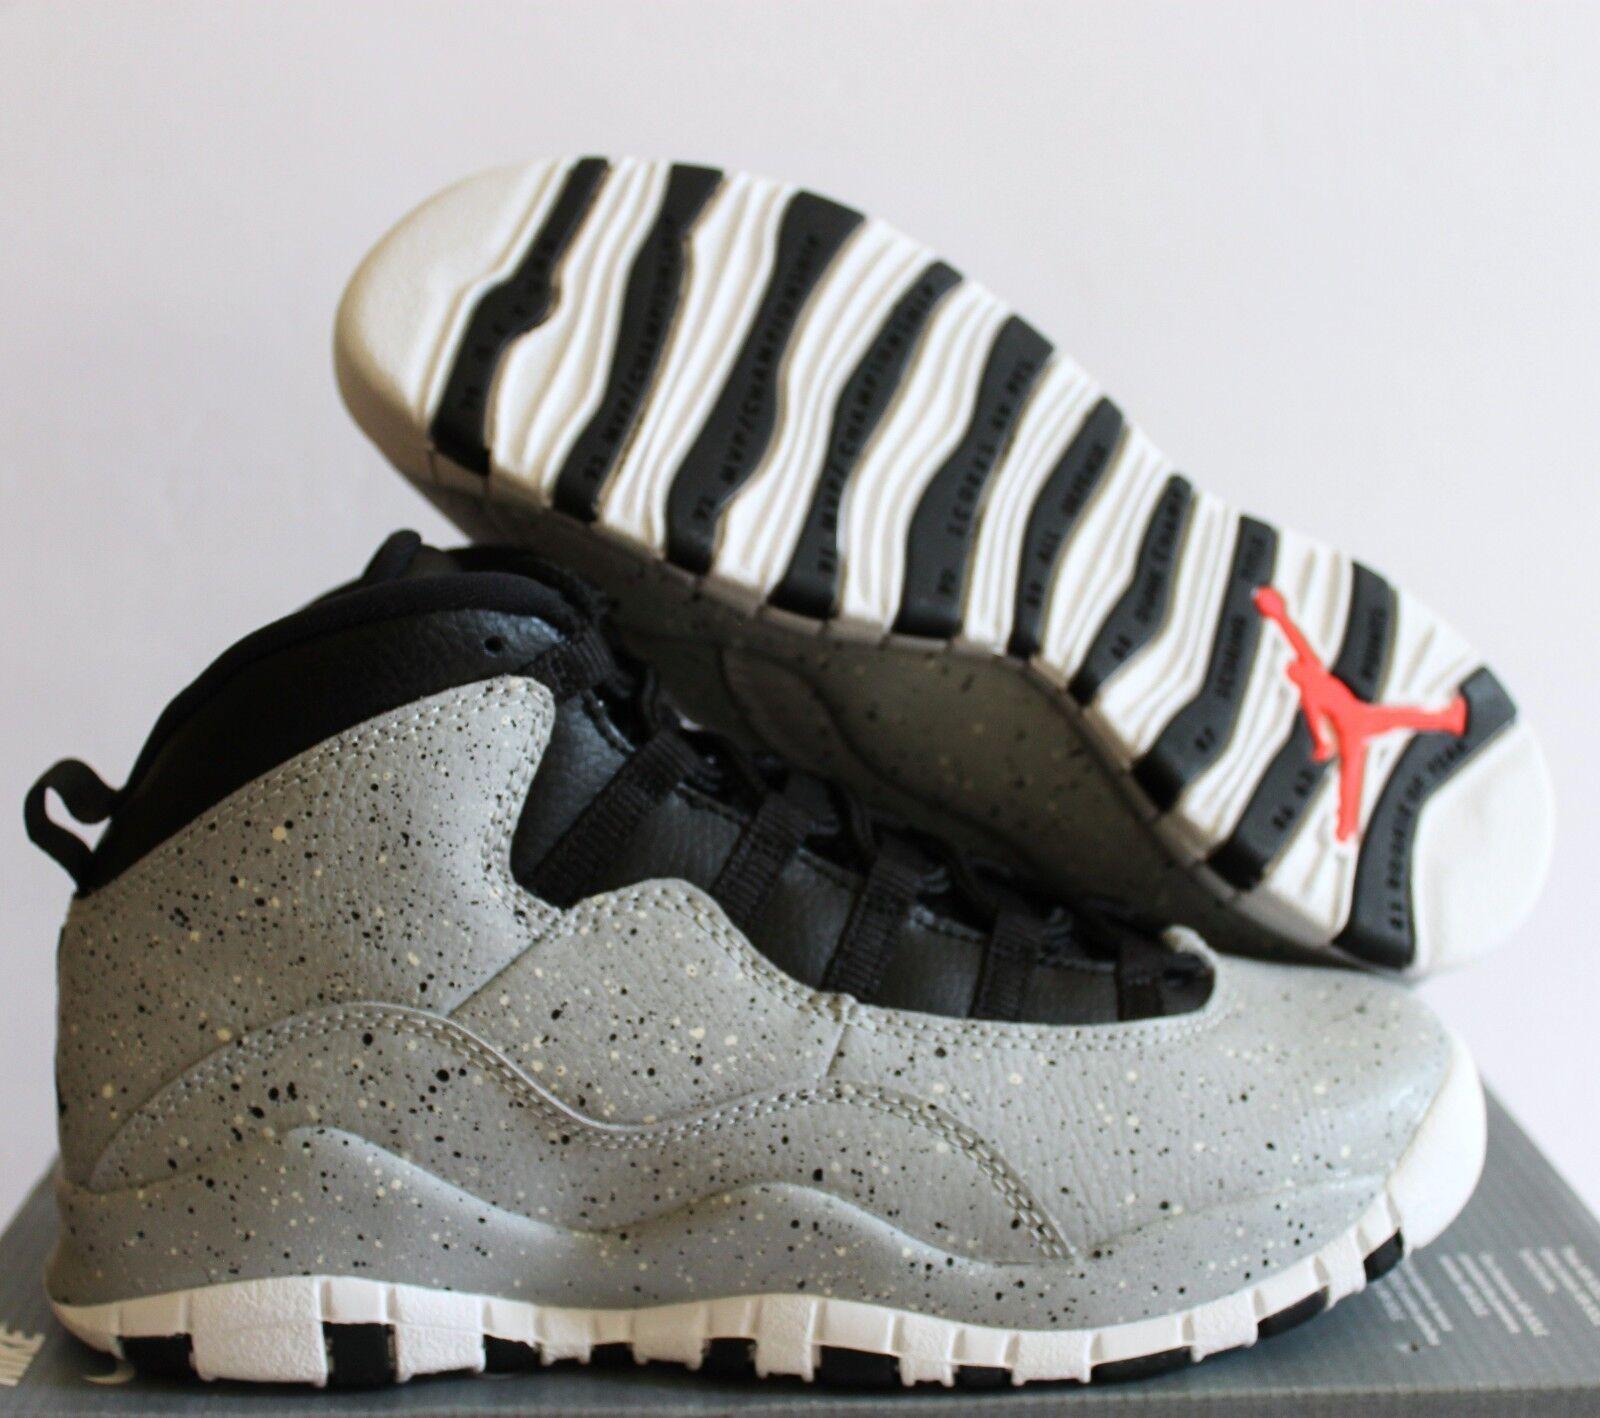 Nike Jordan 10 Retro (GS) LIGHT SMOKE grau SZ 4.5Y    WMNS SZ 6